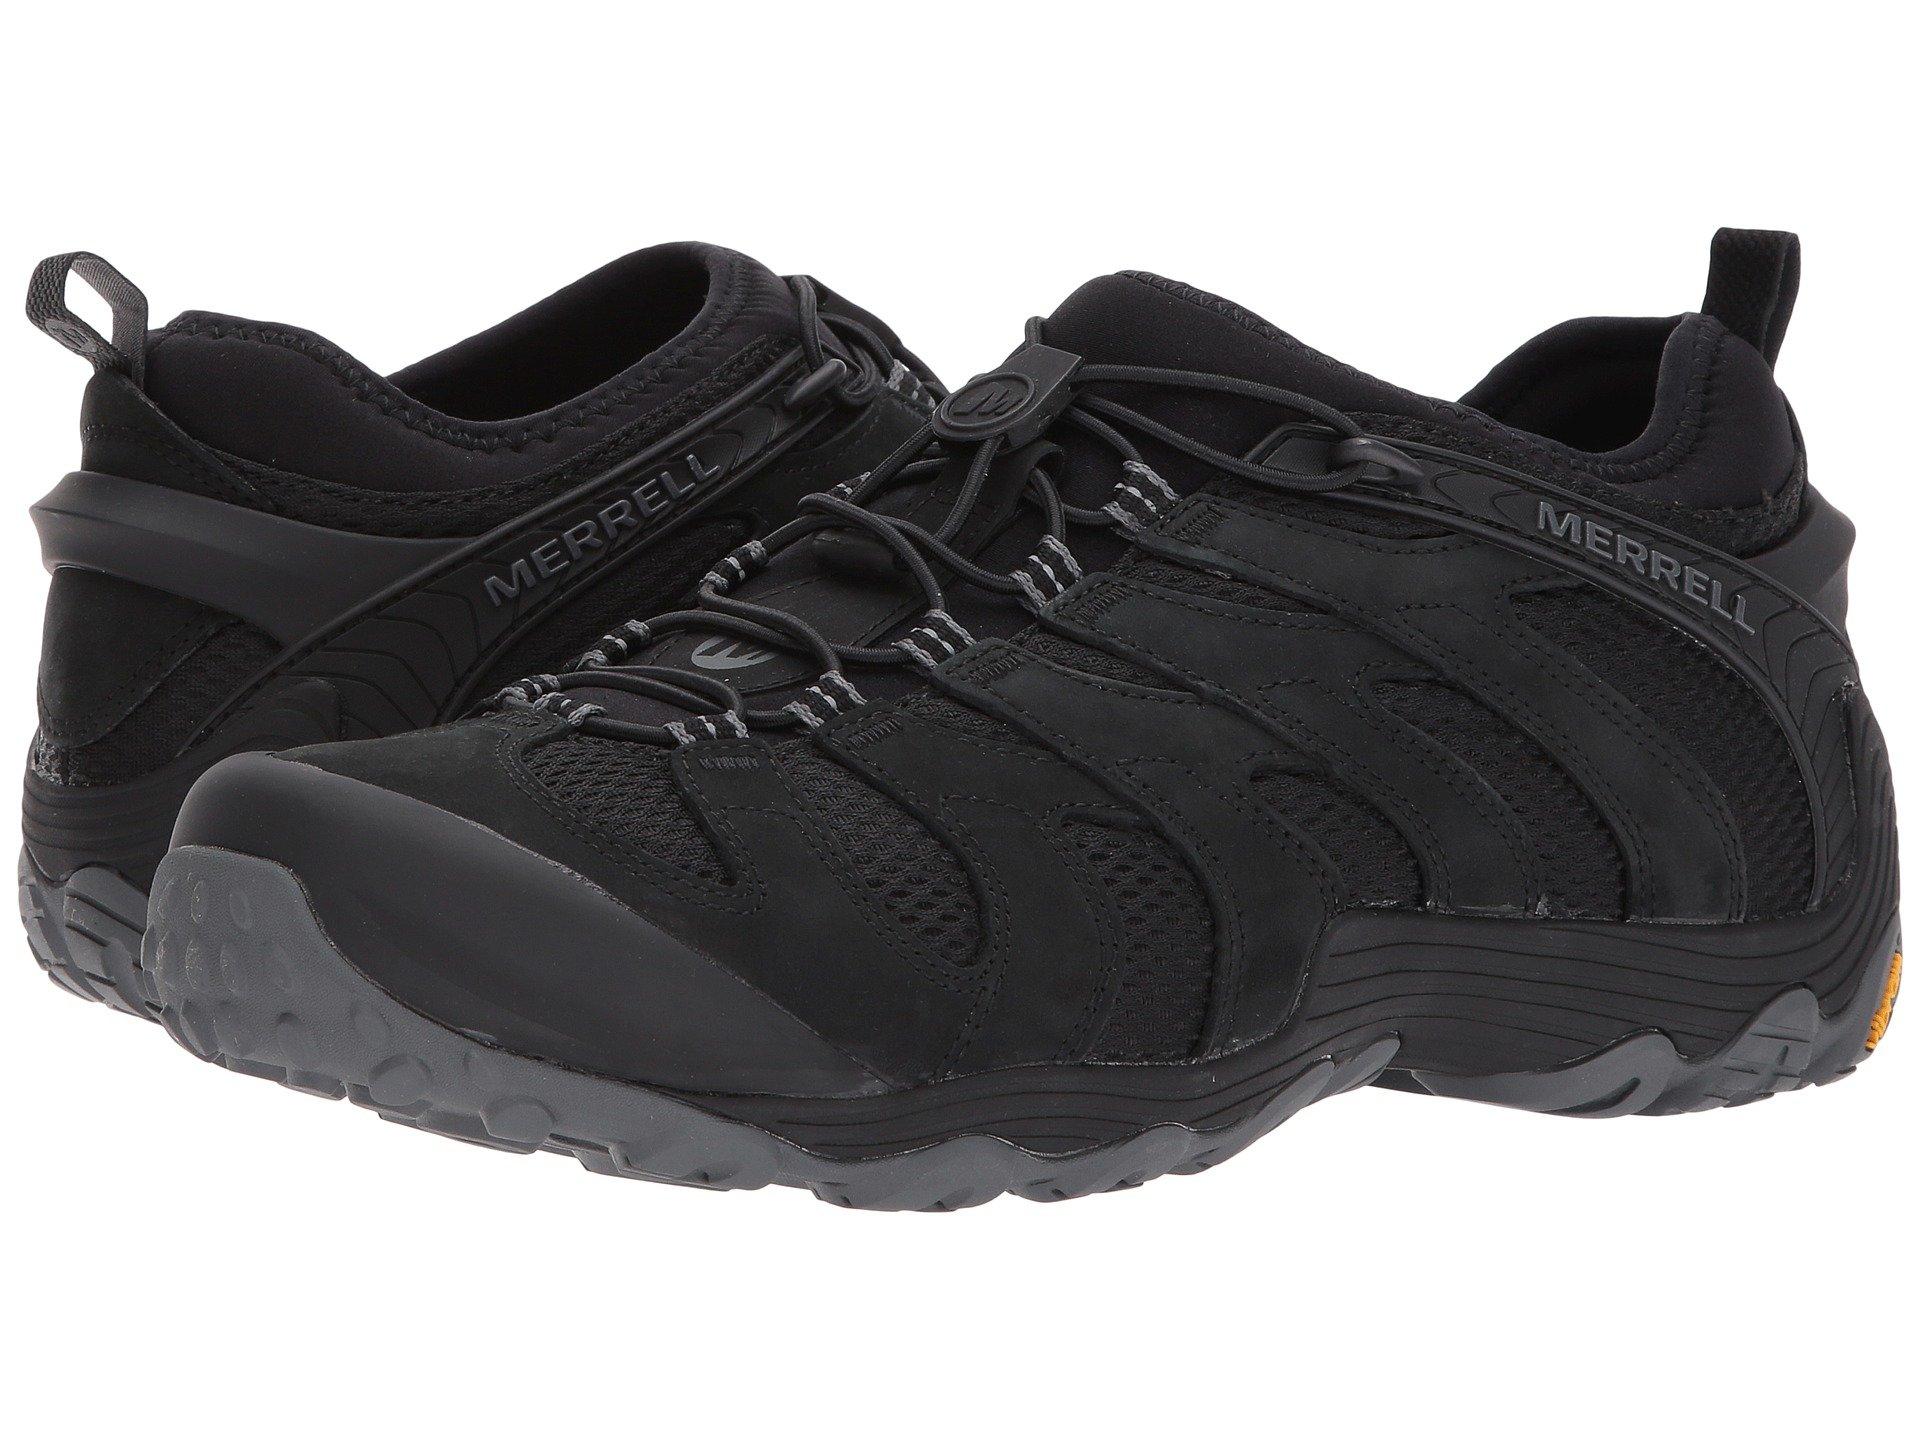 Girls Merrell Hiking Shoes